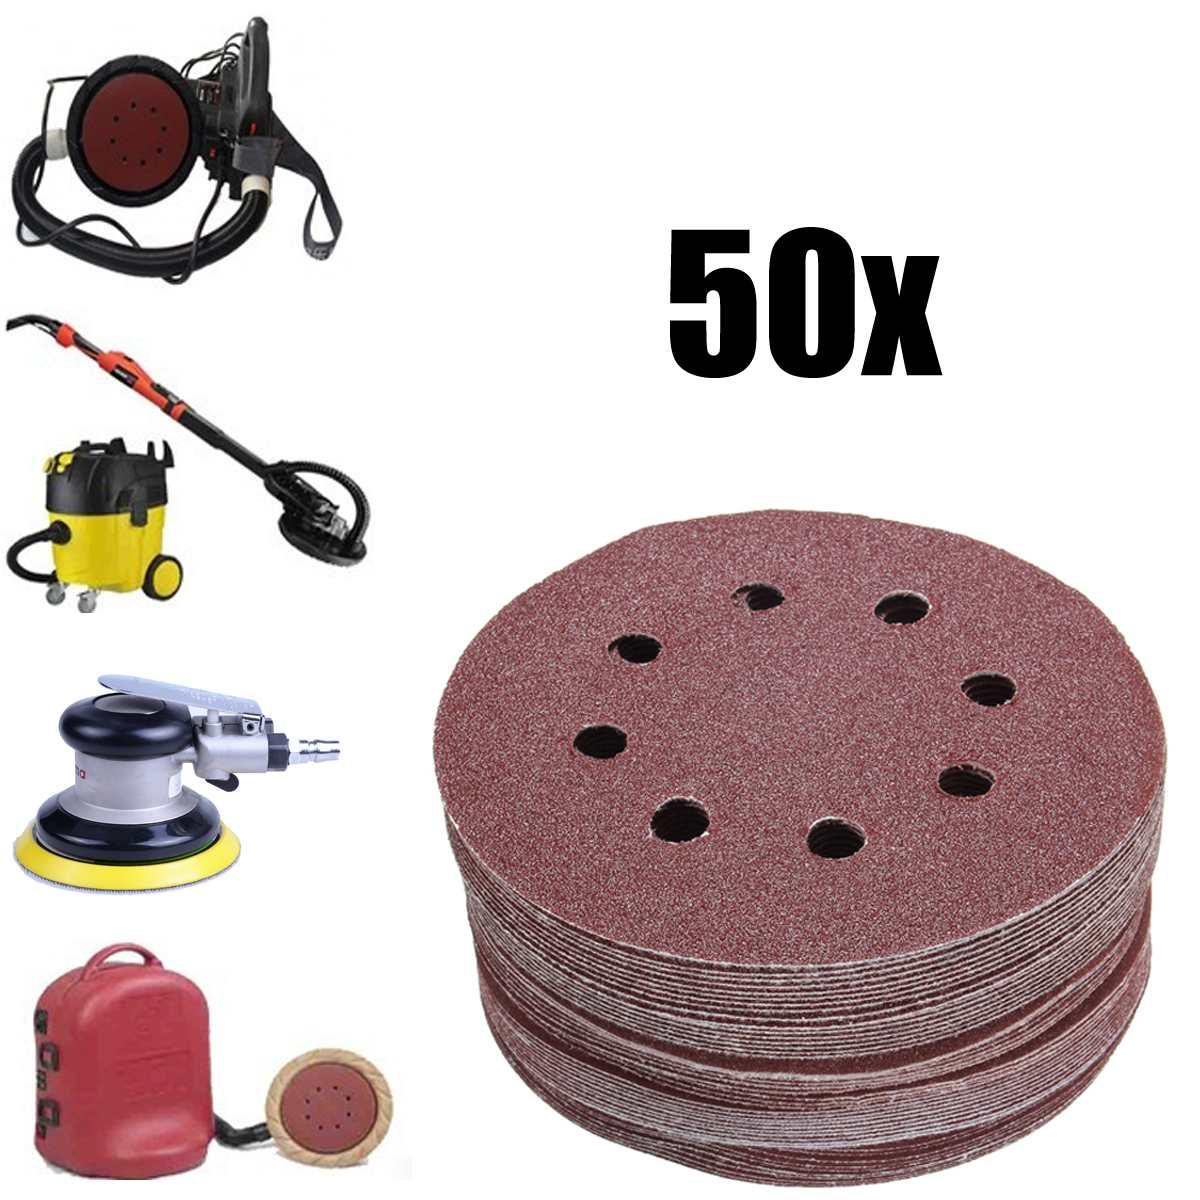 50pcs Sanding Disc 80 Grit 120 180 240 320 Grit Sandpaper 5'' 8 Hole Hook Loop Mixed Pad Abrasives Tool Polishing Discs